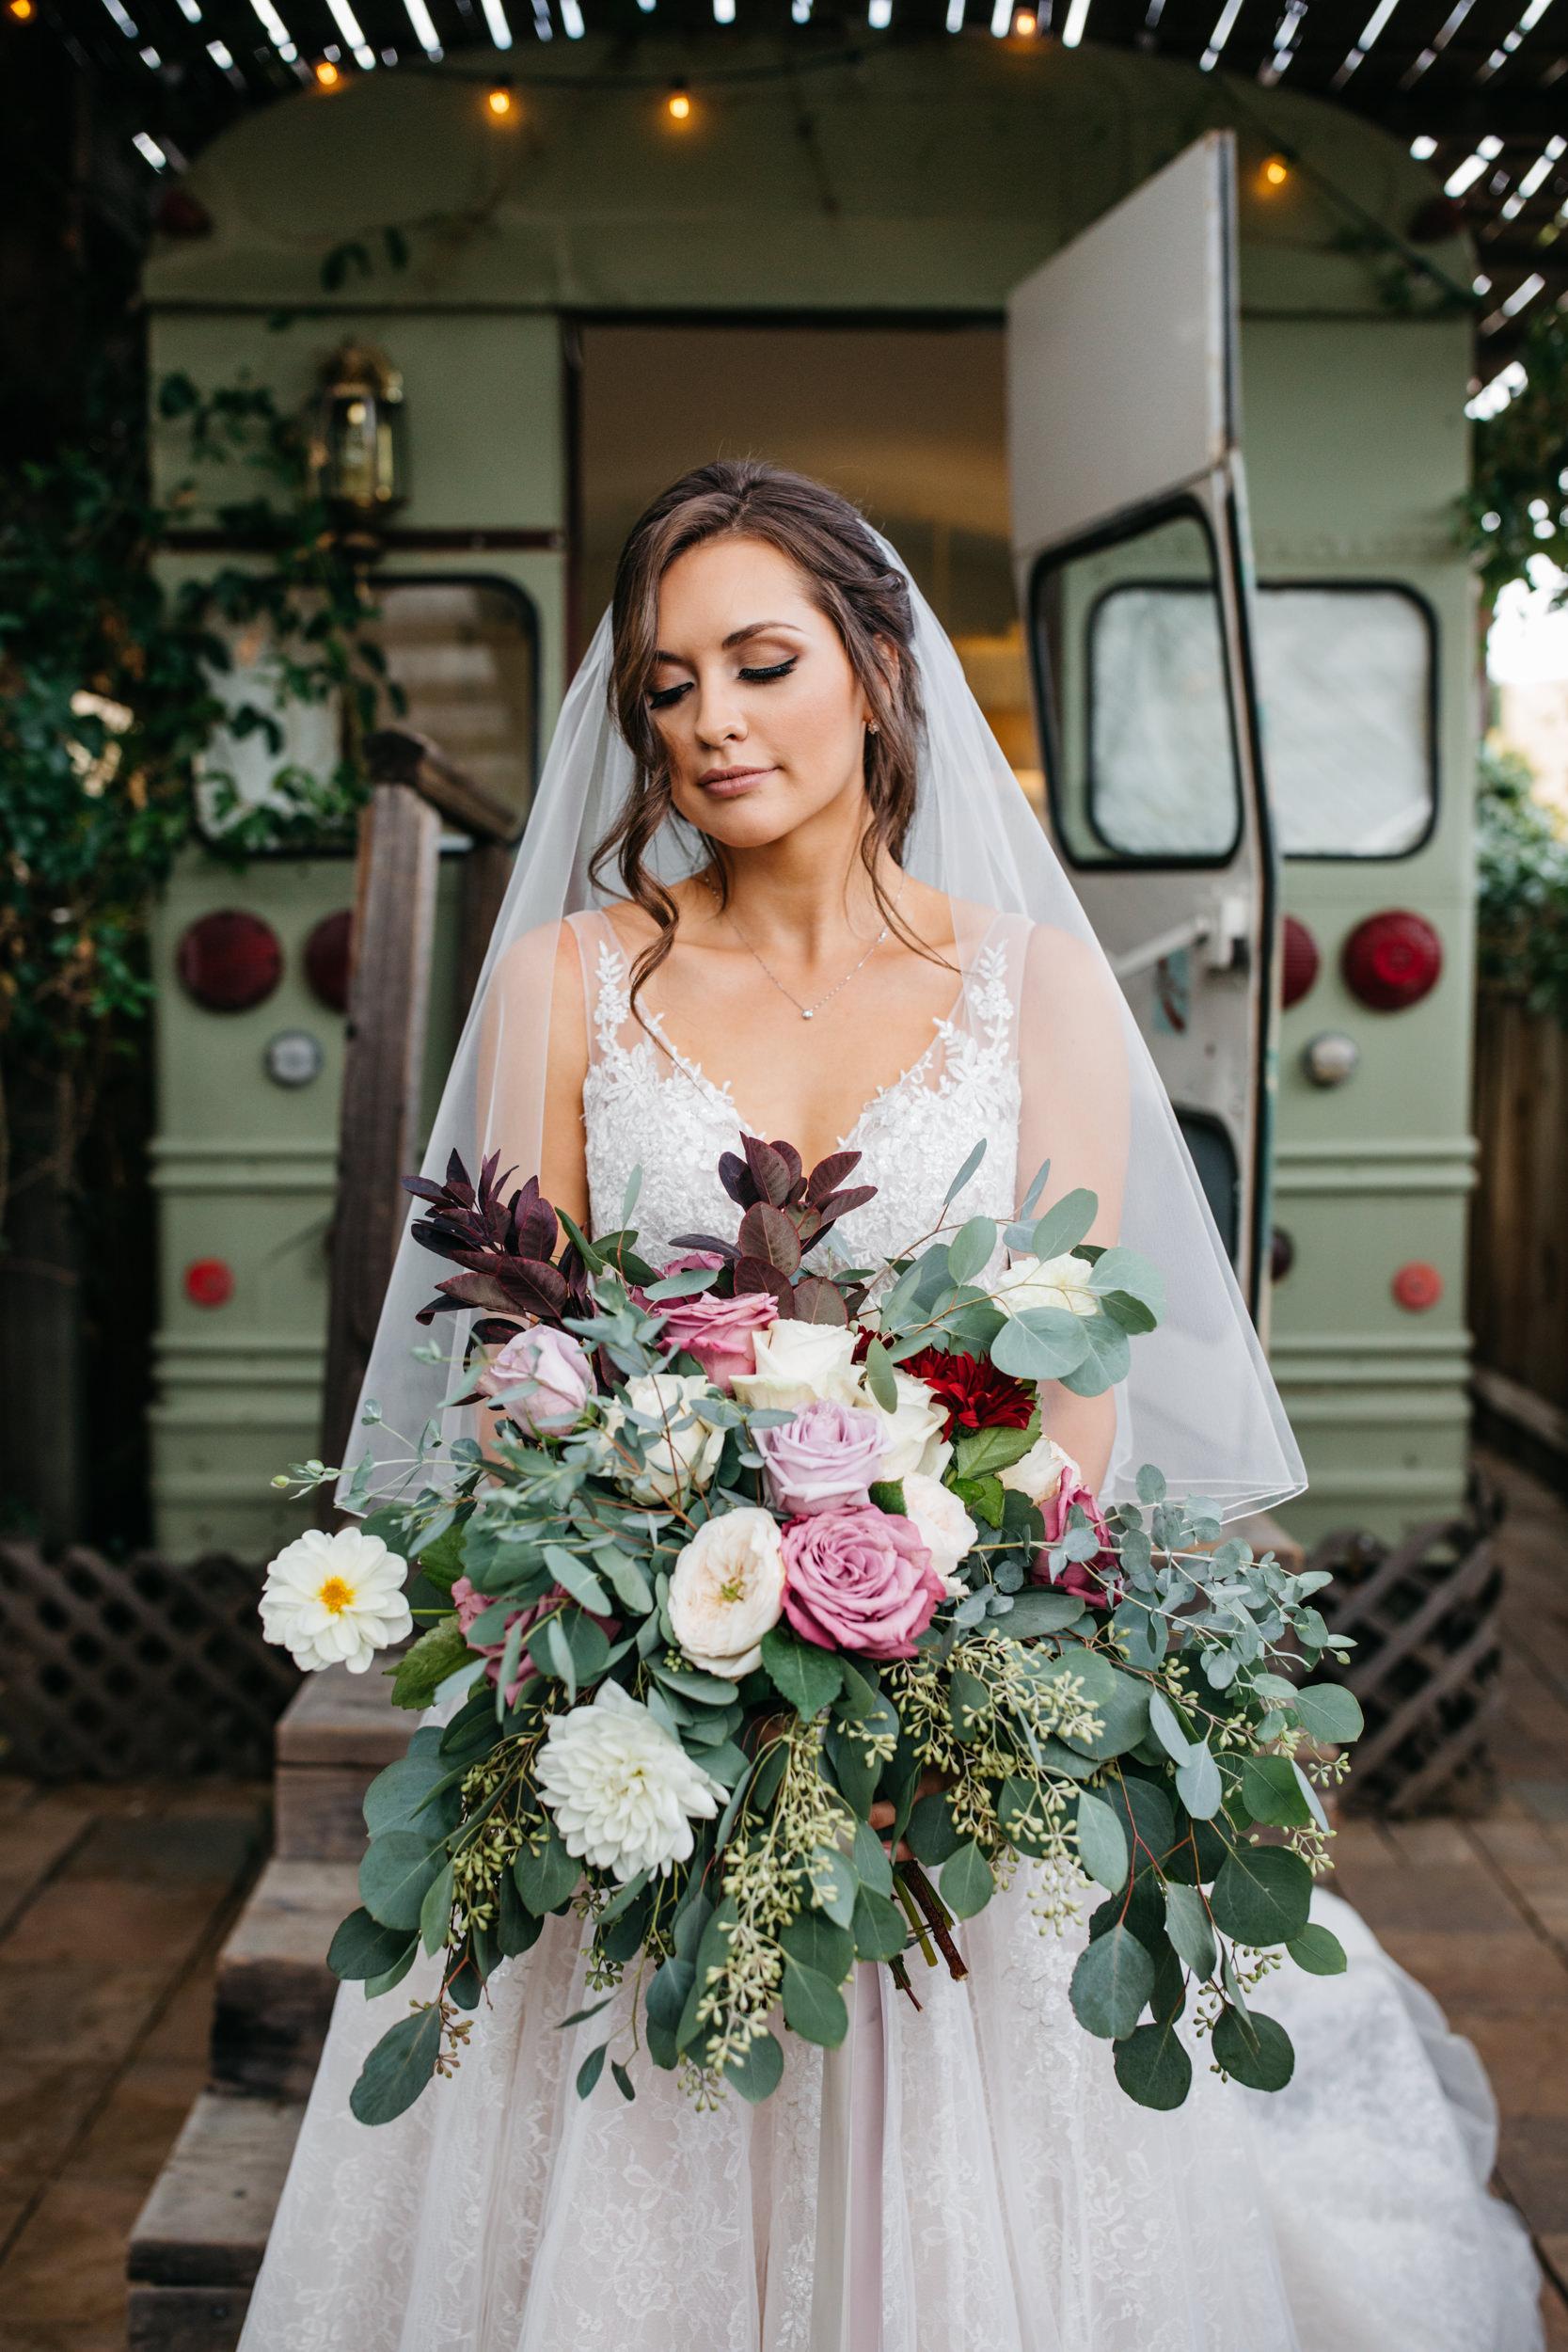 Nazariy_Tanya_Wedding-45.jpg